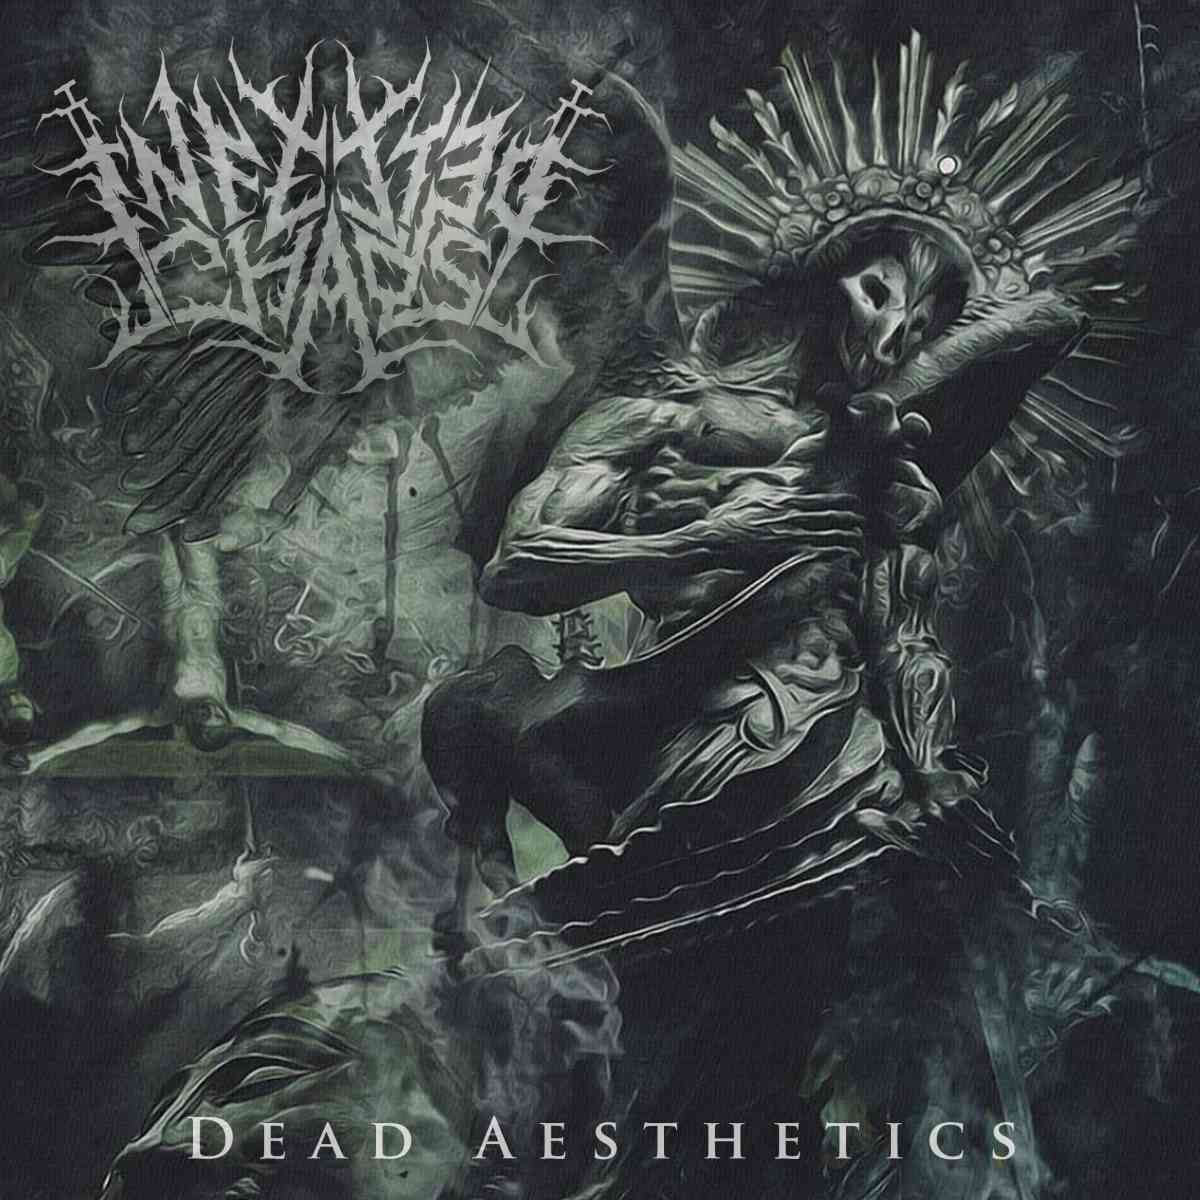 infected chaos - Dead Aesthetics - album cover